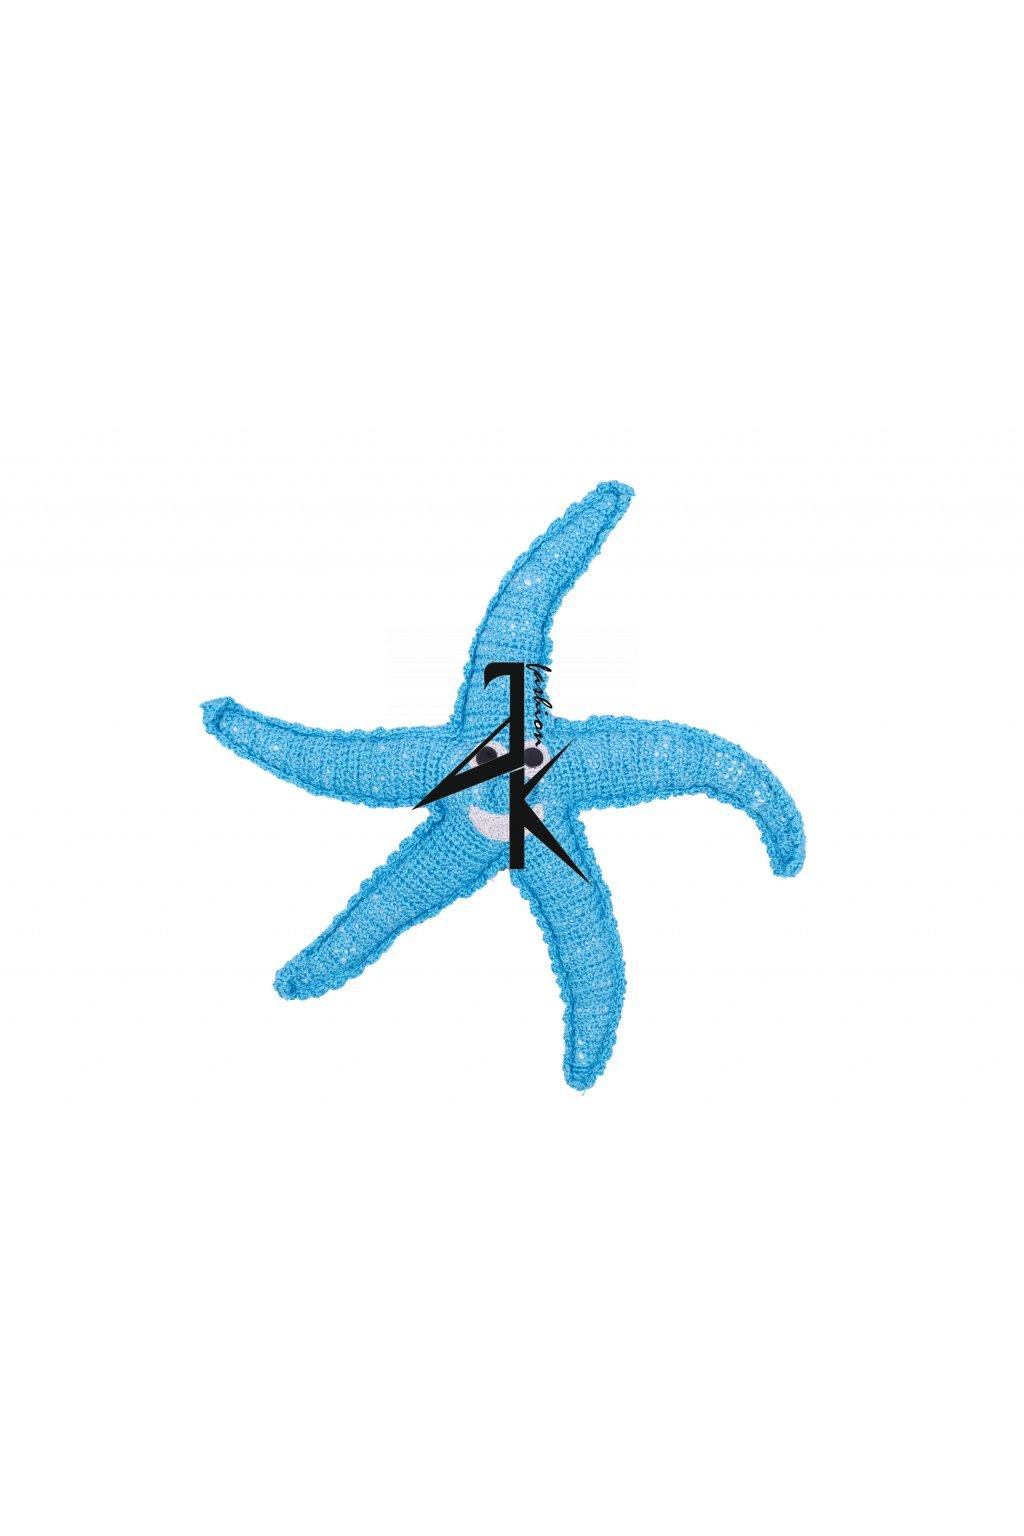 dekorace hracky hackovana hvezda modra 11105824